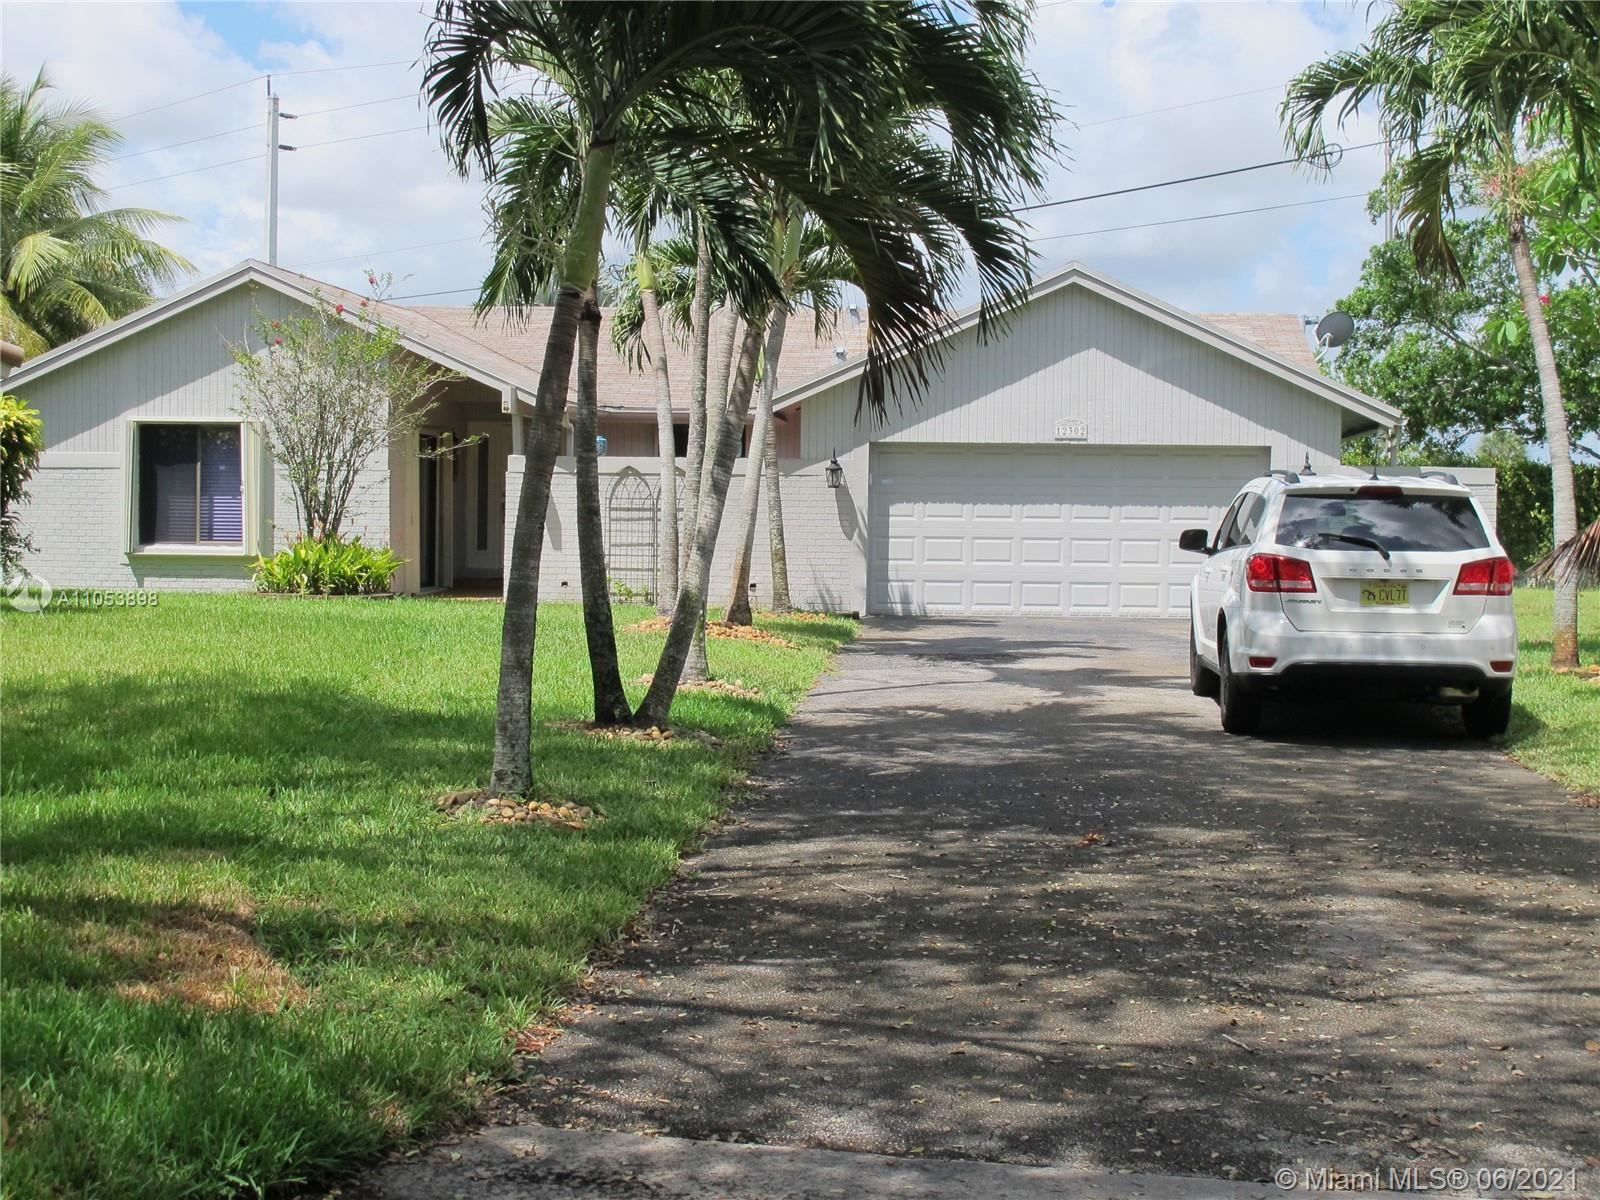 12302 Paseo Way, Cooper City, FL 33026 - #: A11053898